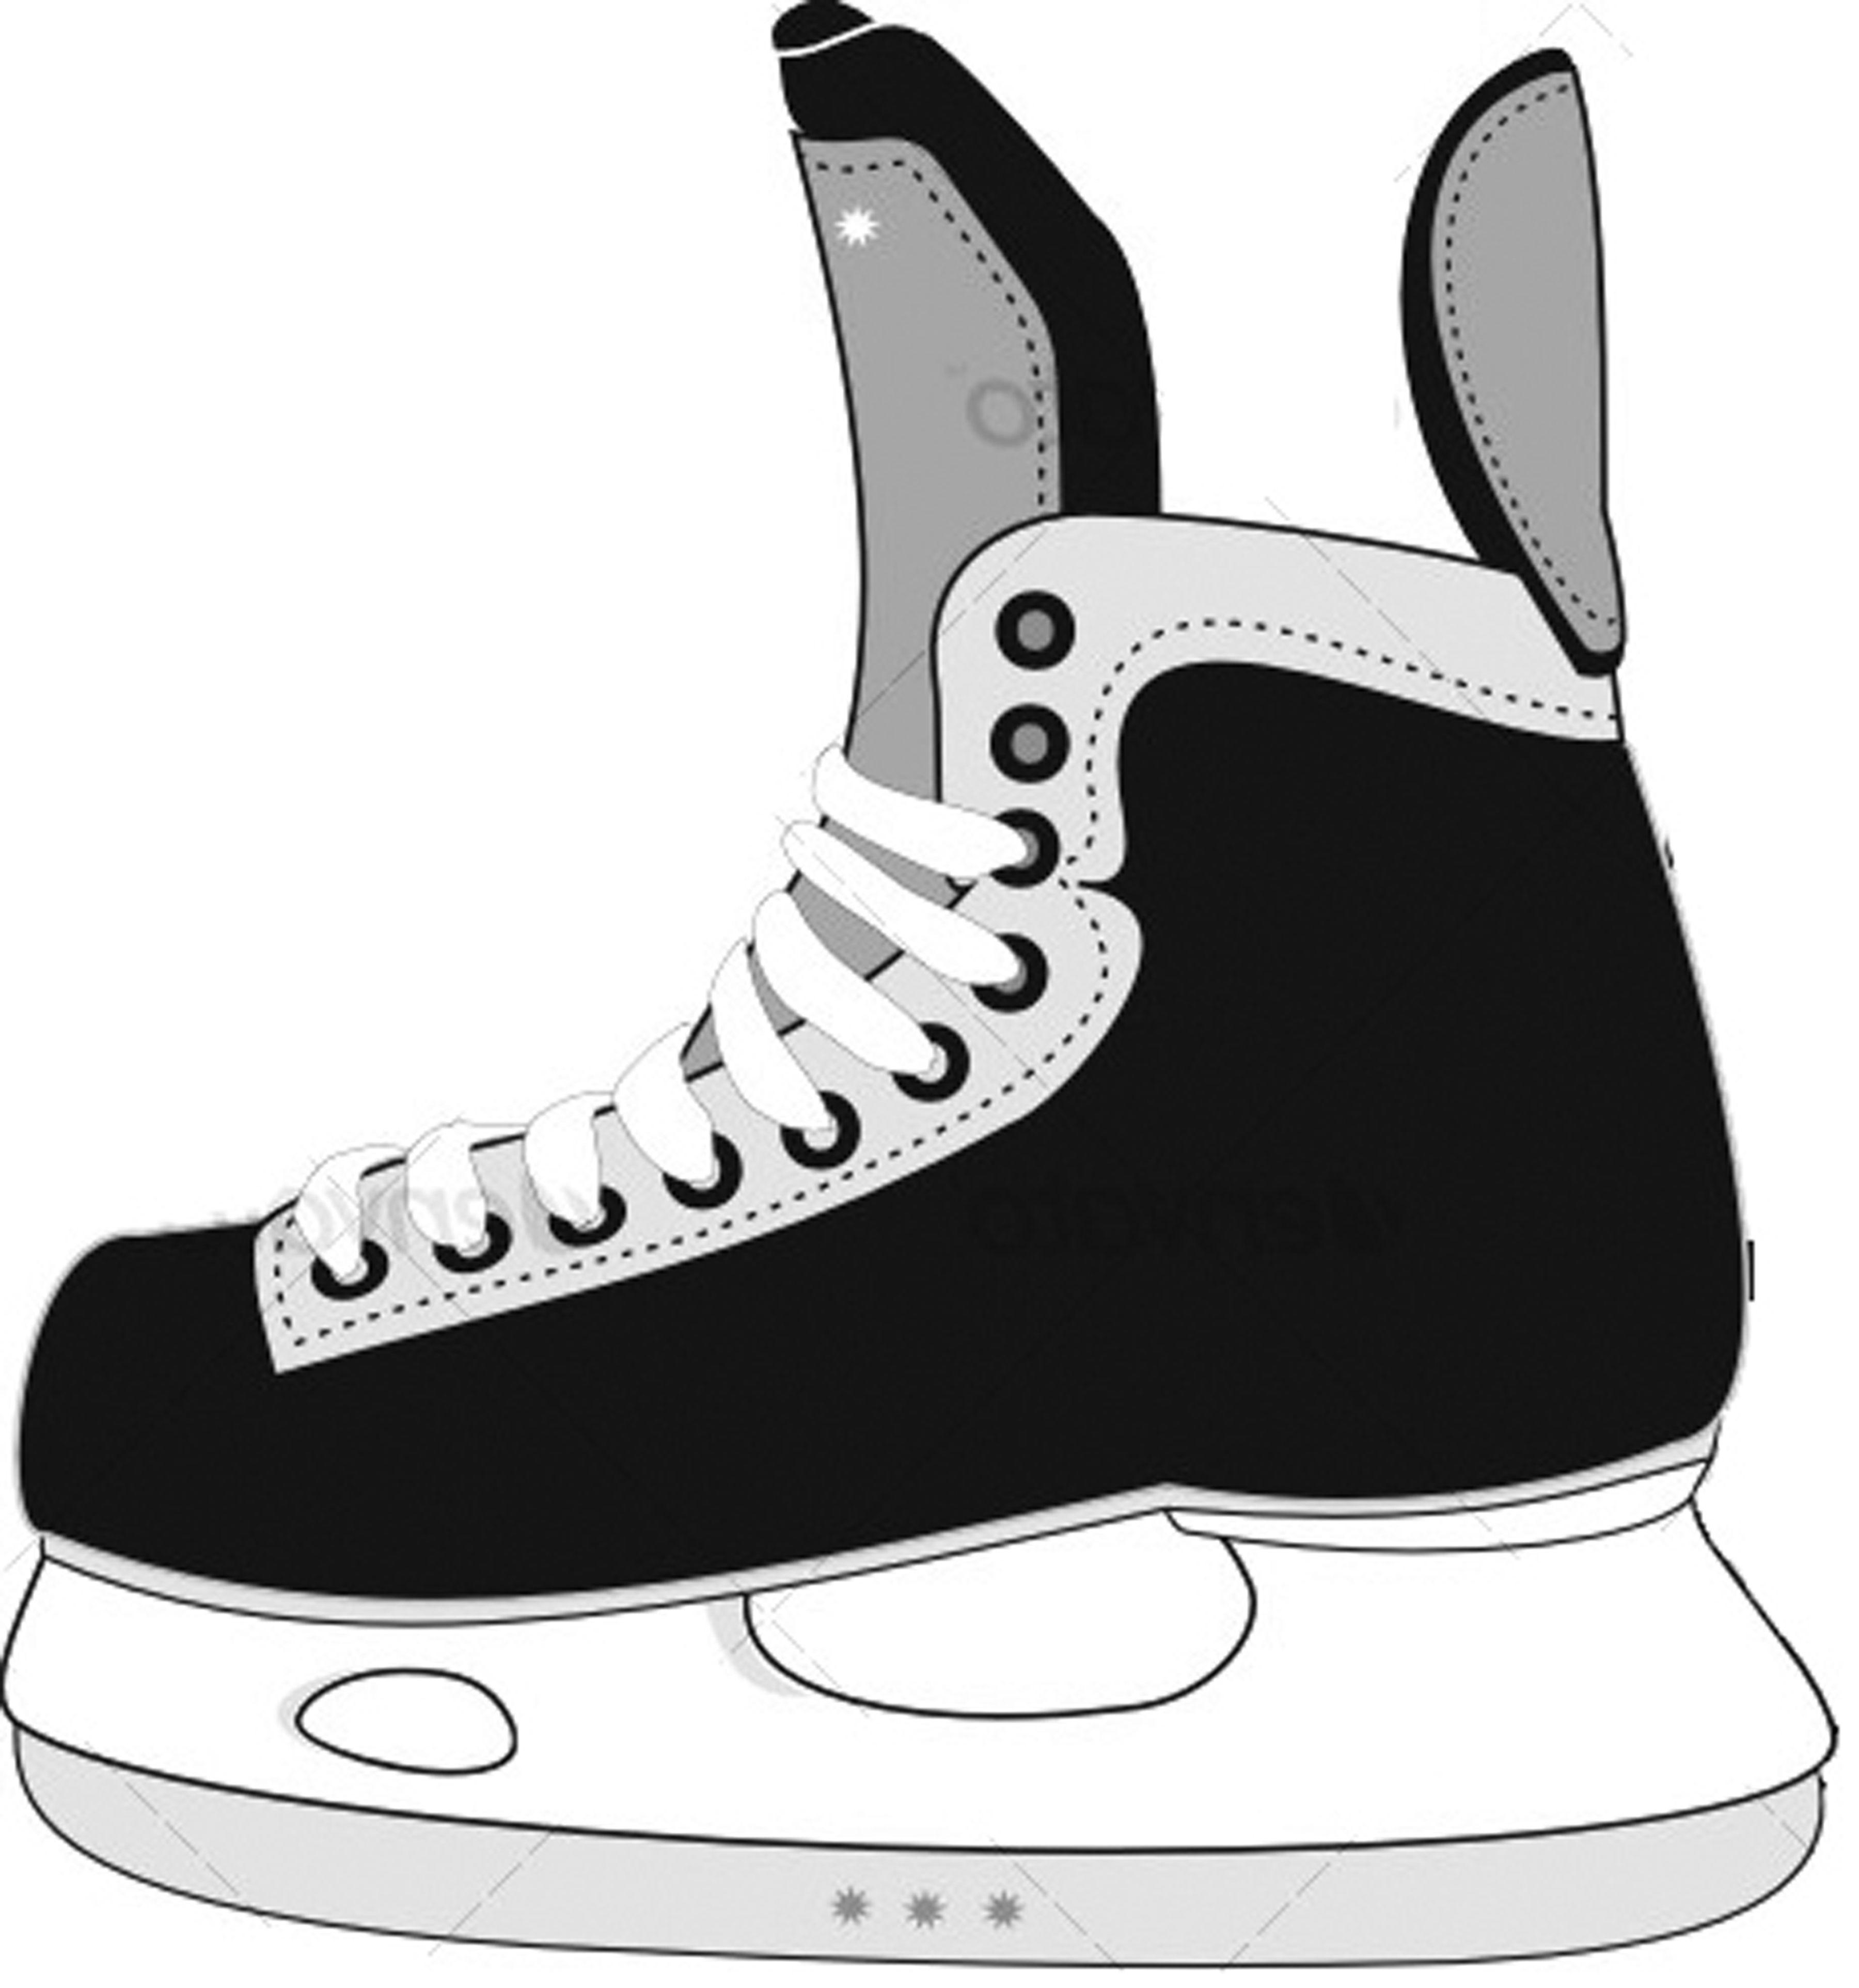 medium resolution of hockey clipart hockey tournament 663